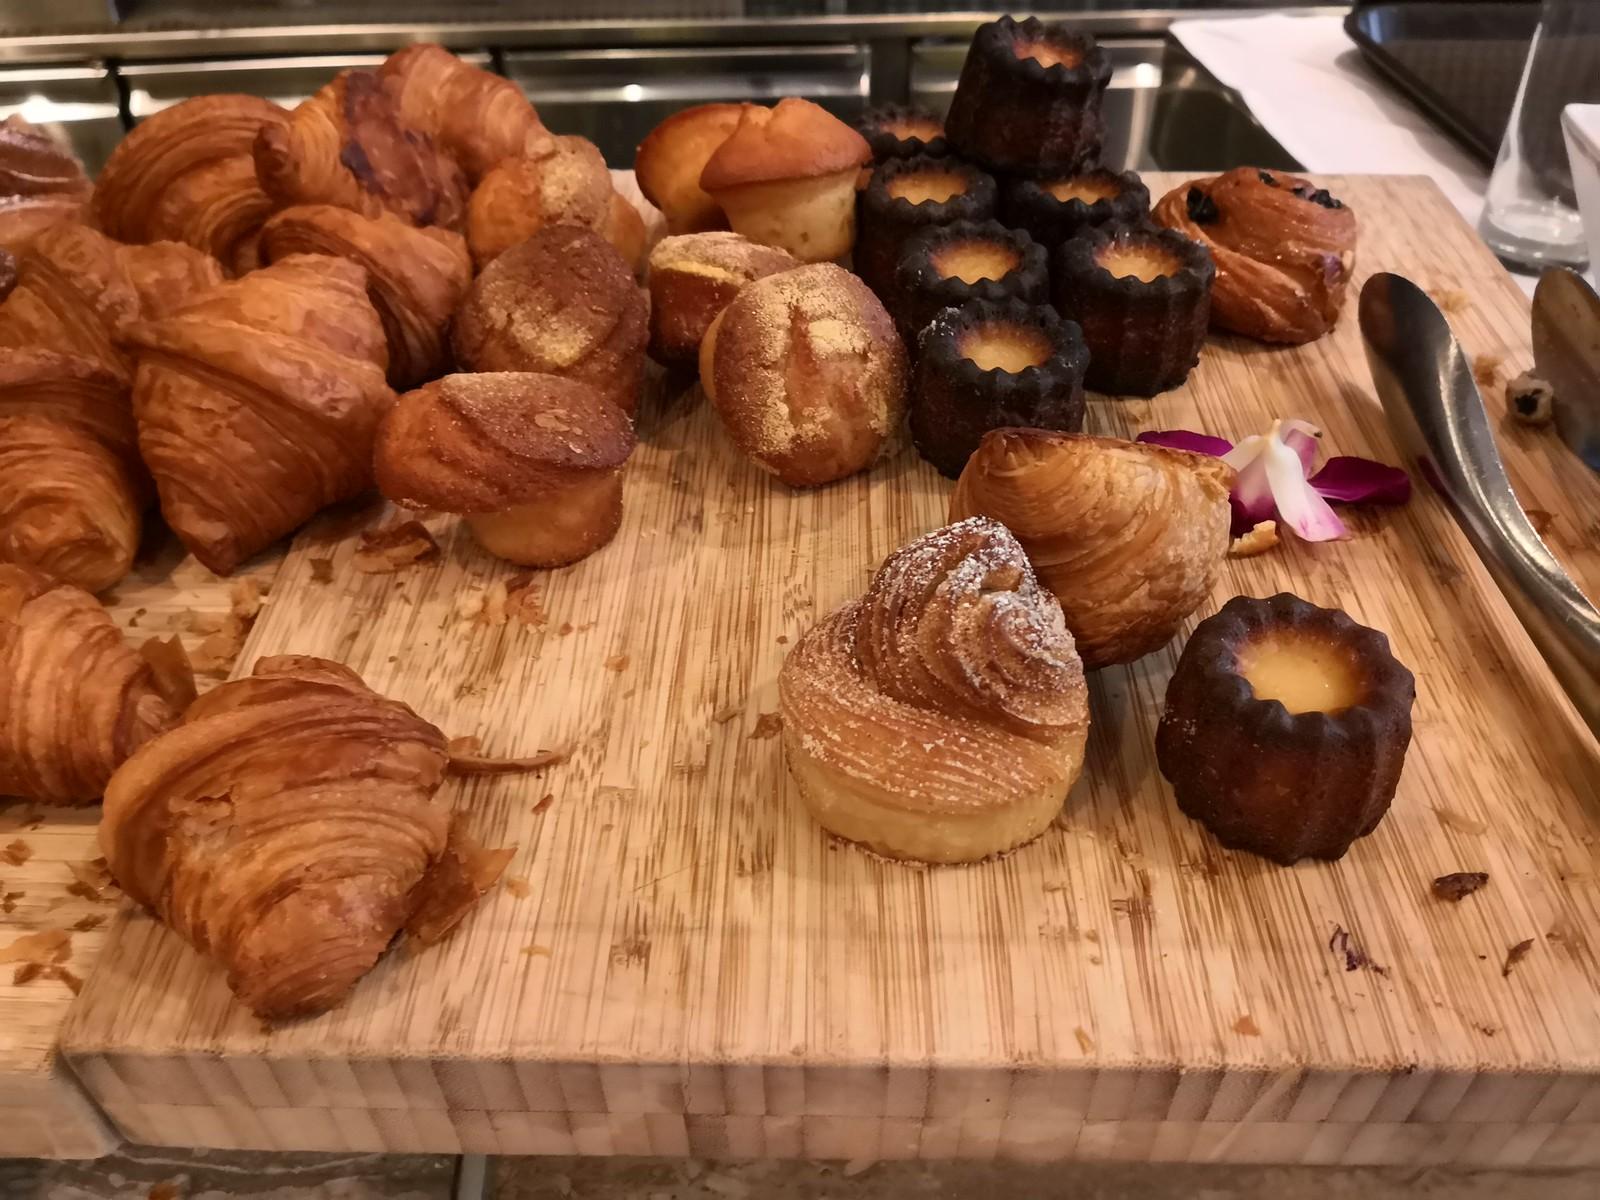 Croissants and caneles